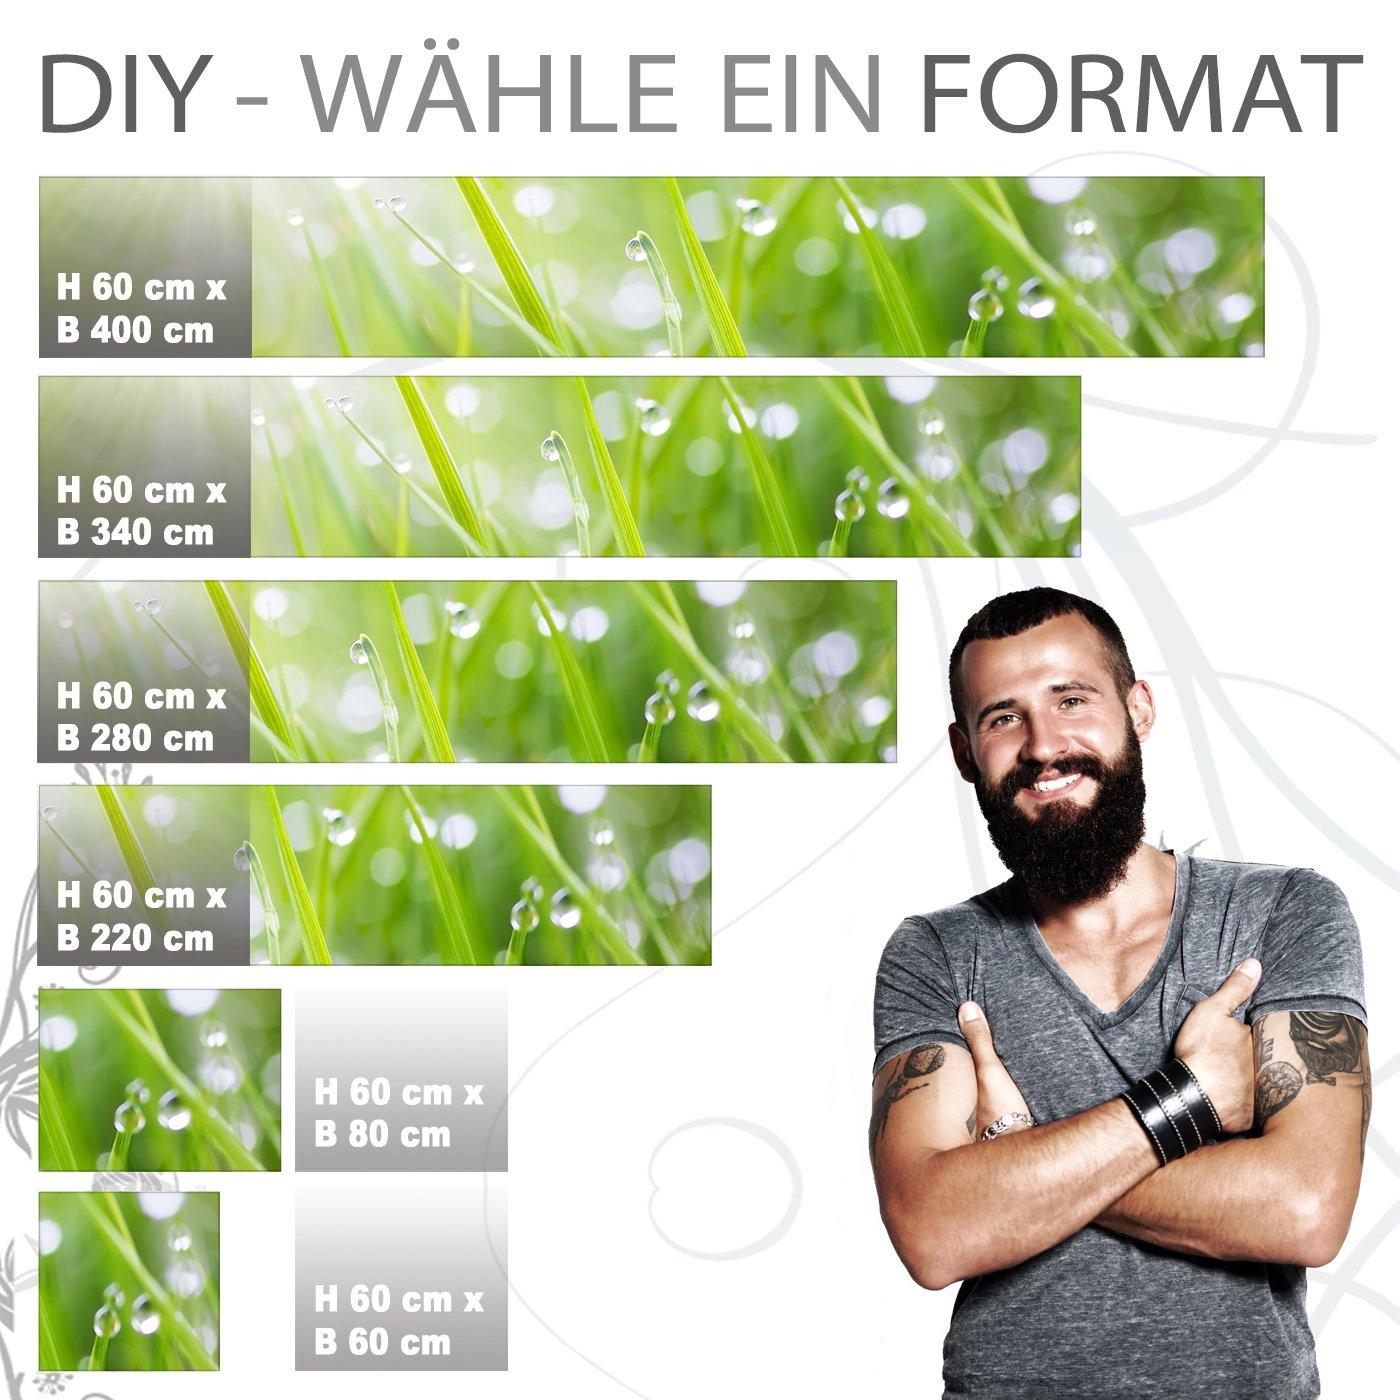 StickerProfis Küchenrückwand selbstklebend Pro MODERN Grass 60 x 340cm DIY DIY DIY - Do It Yourself PVC Spritzschutz 1d4507